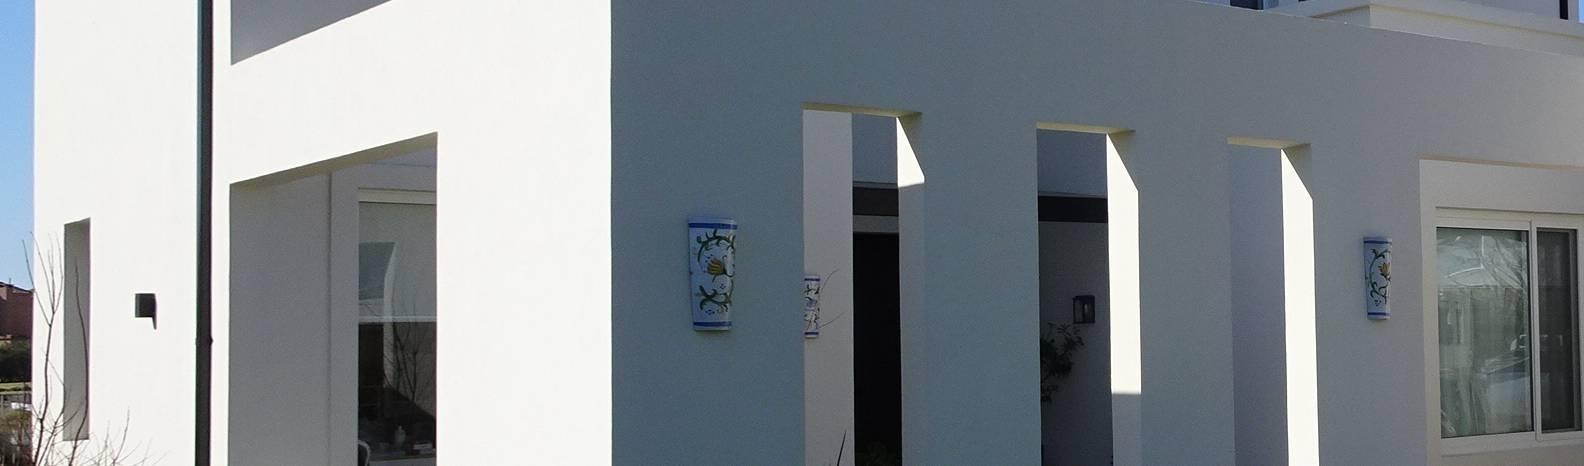 Estudio Dillon Terzaghi Arquitectura—Pilar